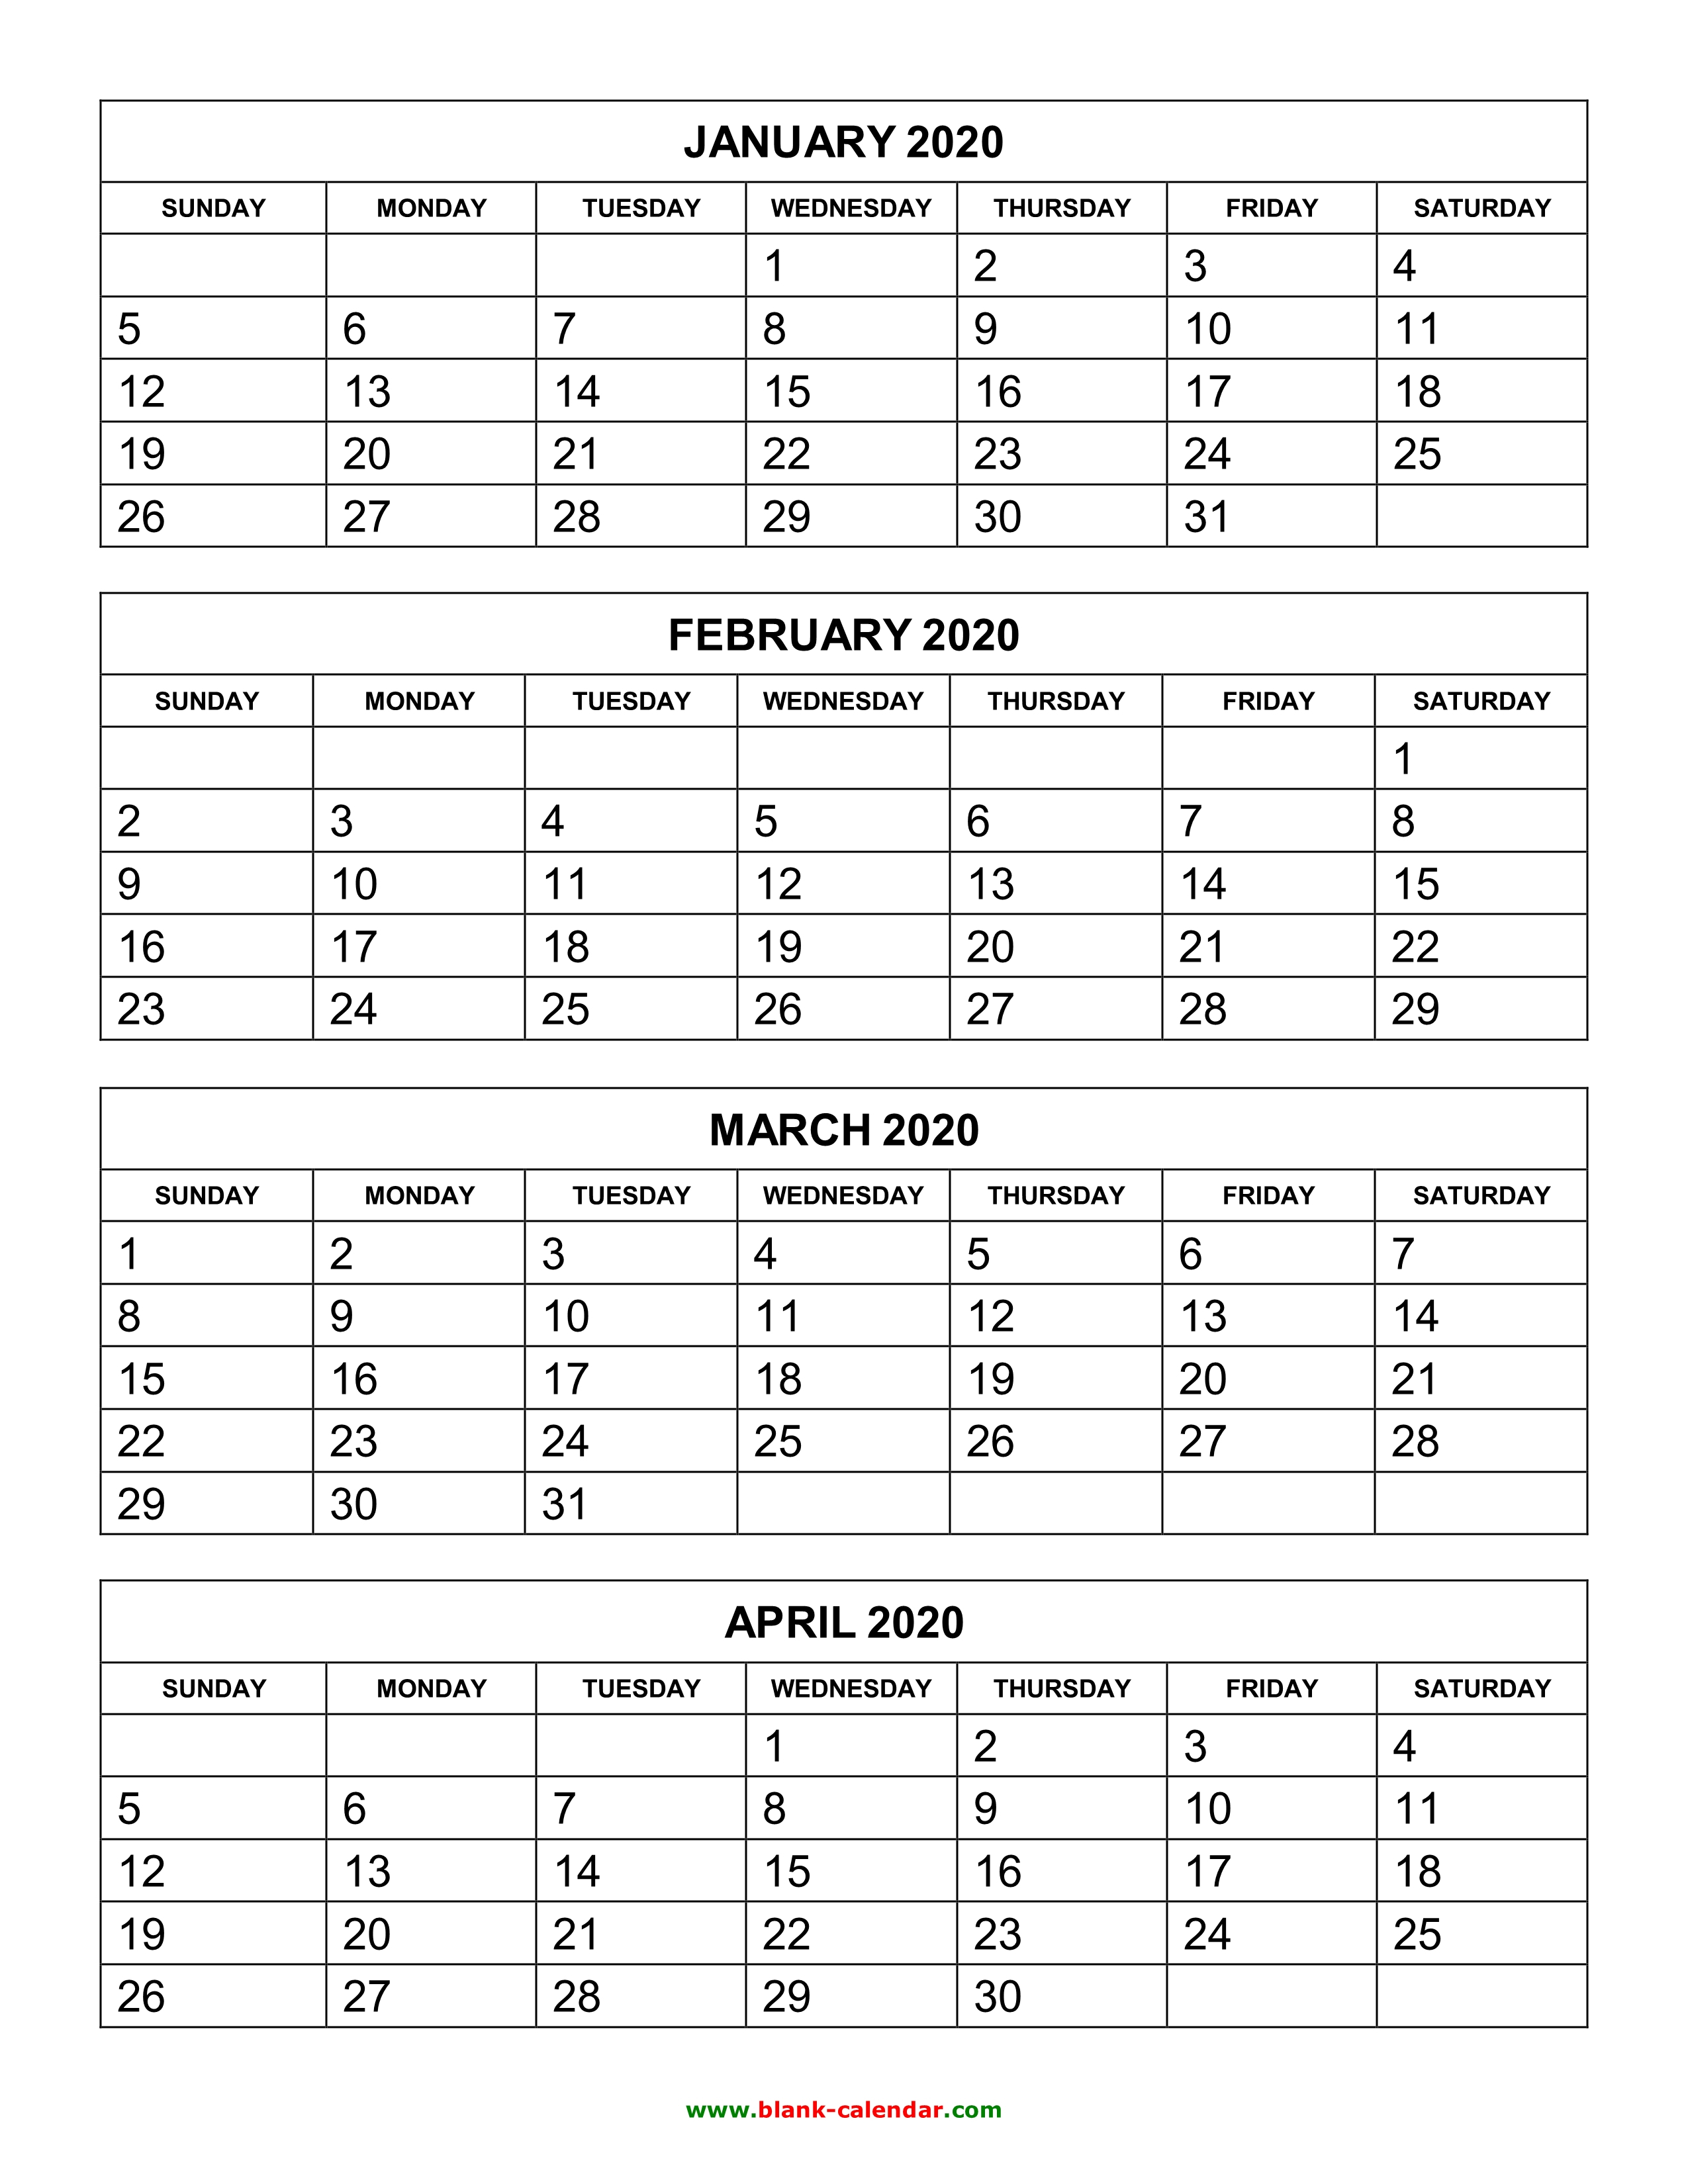 Free Download Printable Calendar 2020, 4 Months Per Page, 3 intended for Printable Calendar 3 Months Per Page